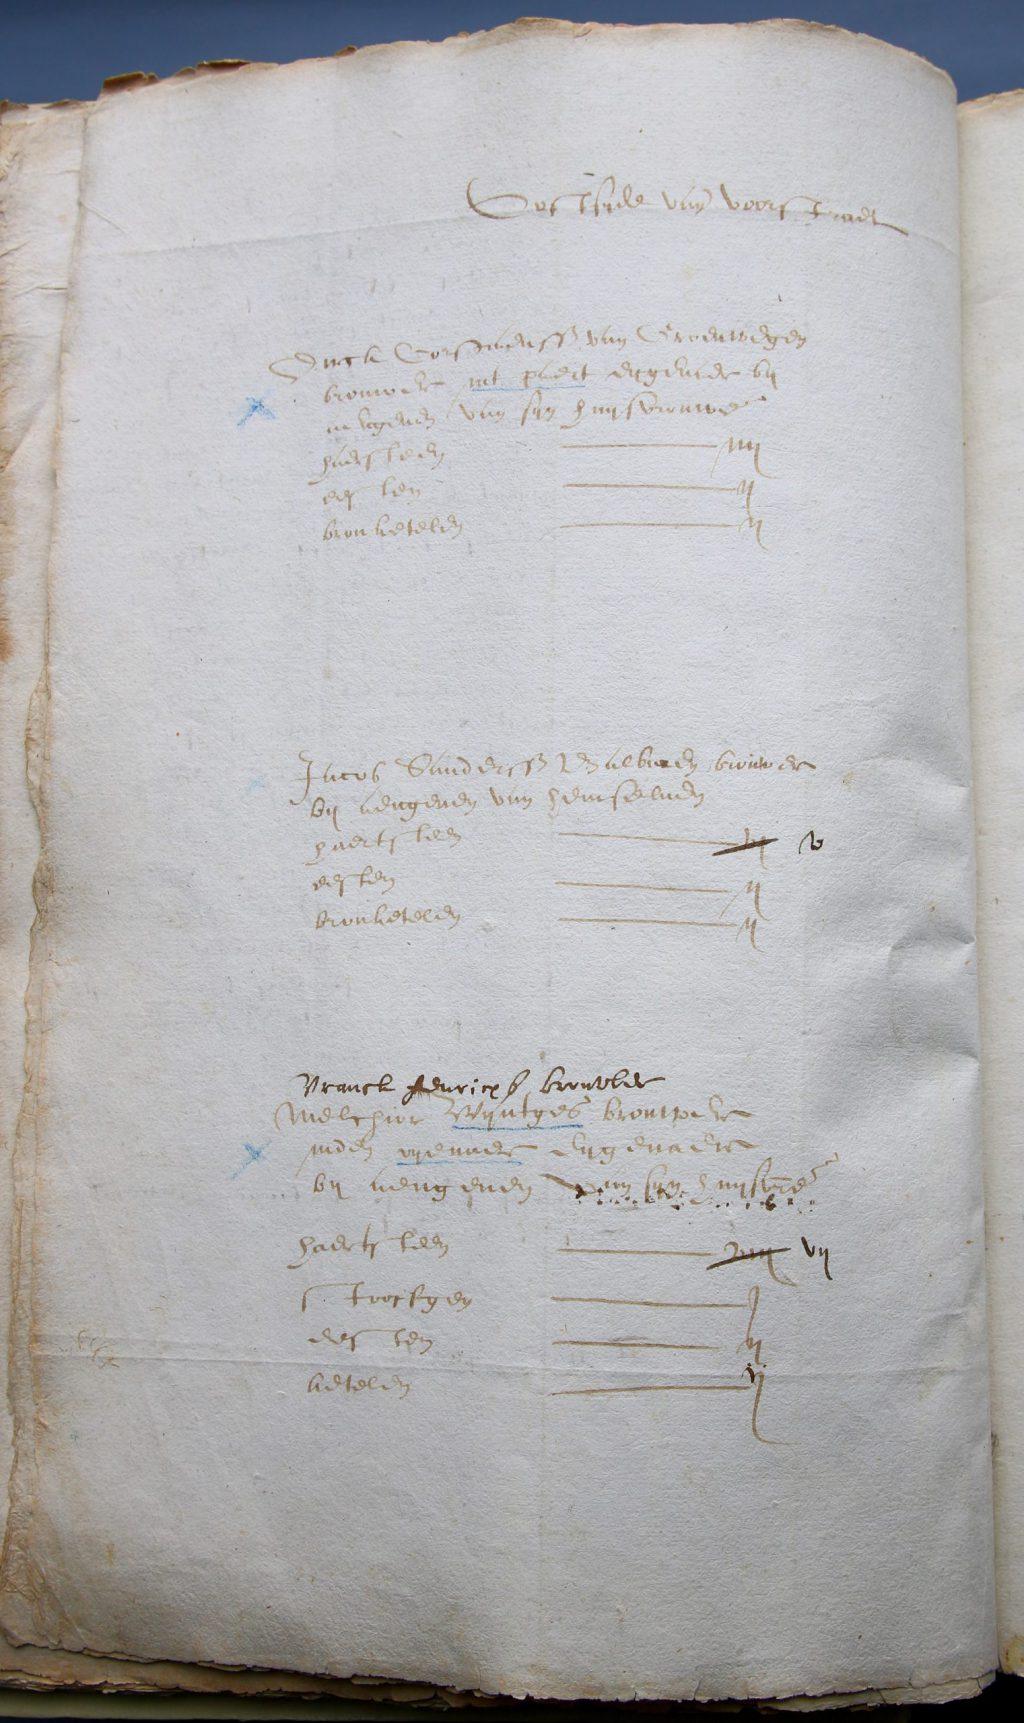 Bladzijde uit het haardstedenregister, 1600 (Archief 1, inv.nr 4081, folio 35v)